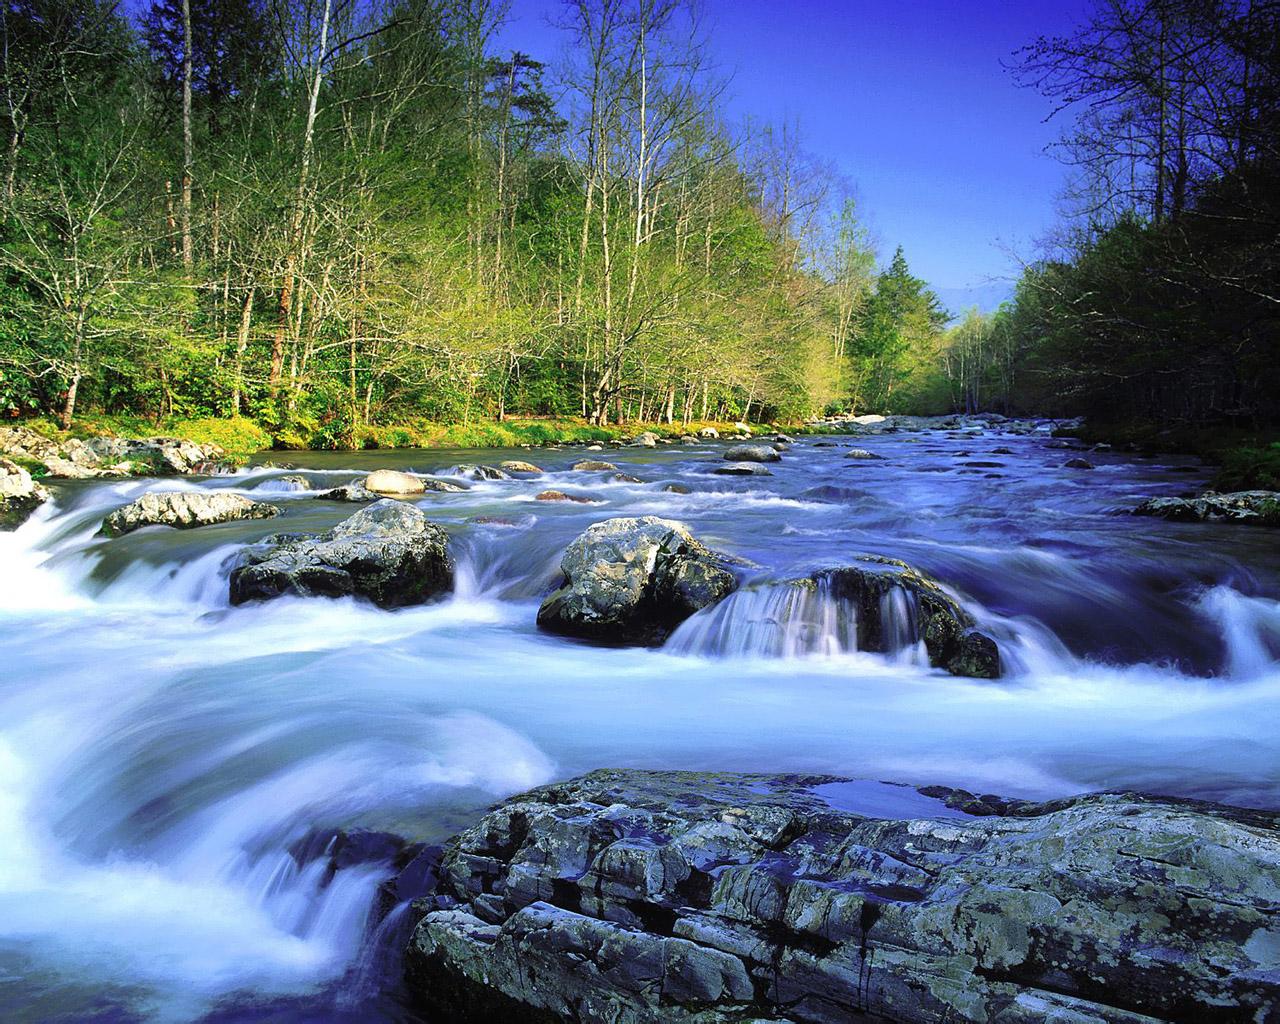 http://4.bp.blogspot.com/-zTLPk8b6DUk/TdkvfA3WycI/AAAAAAAAAcA/Rcuez6HCC04/s1600/1280_1024_nature_scene_wallpaper_1600FG100_2_083.jpg